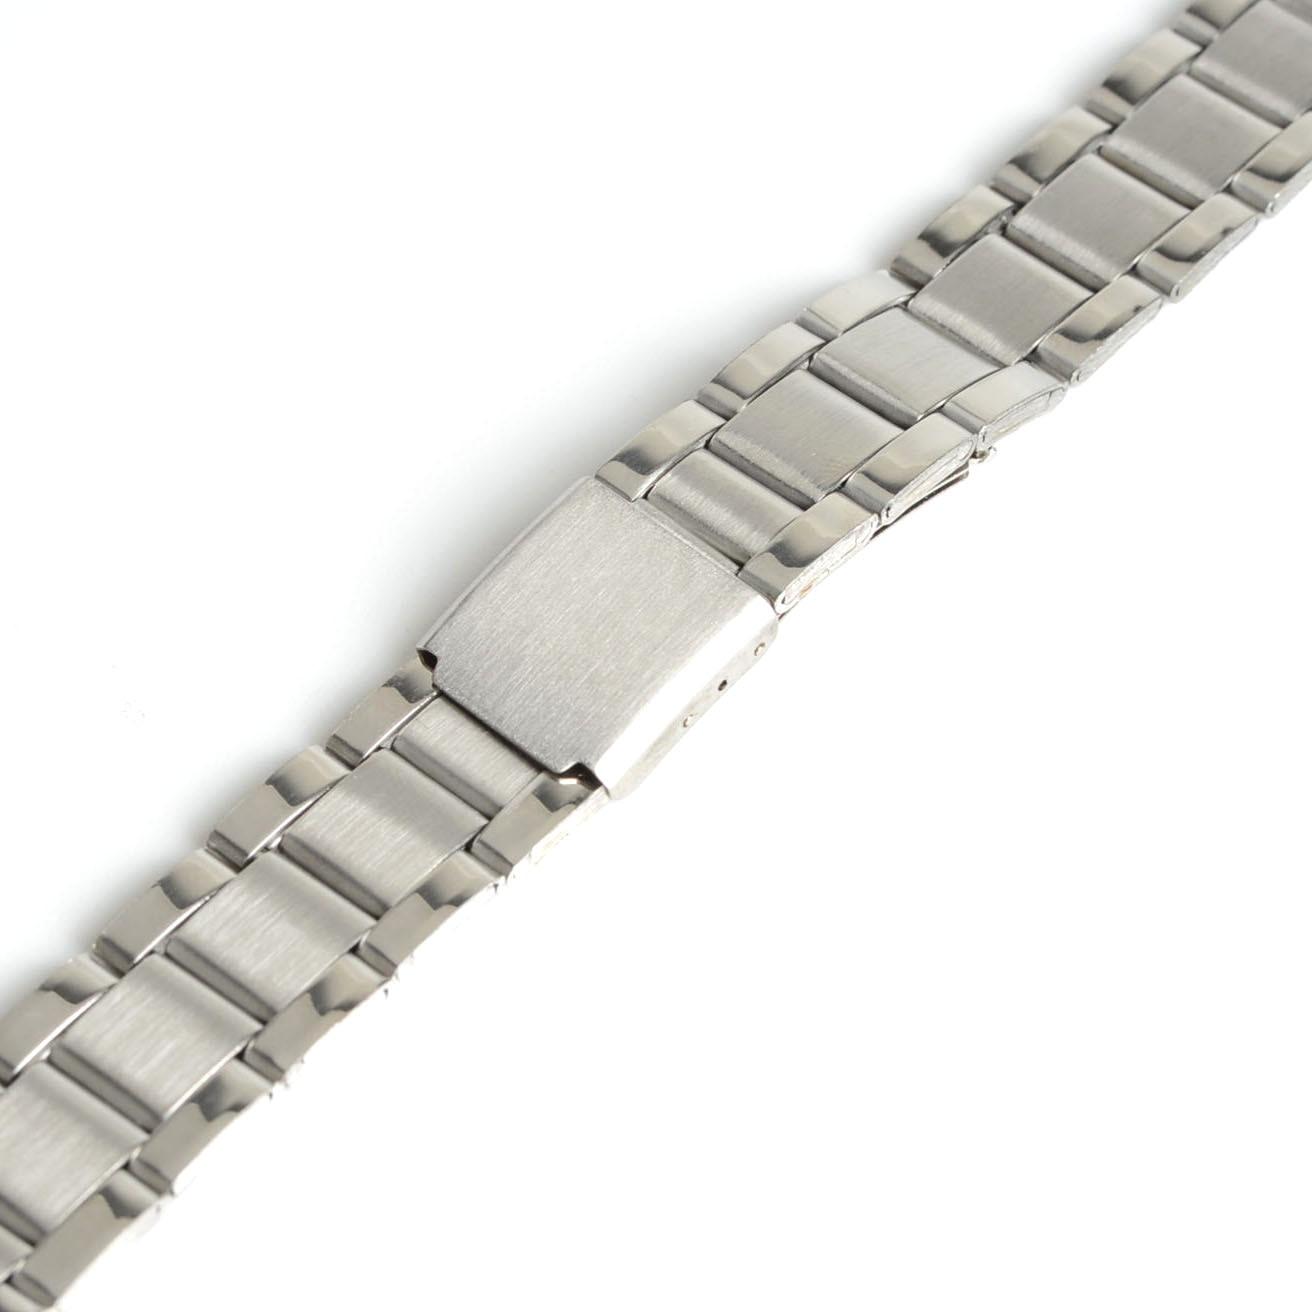 2019 New Men Women 12mm Silver Stainless Steel Watch Band Strap Bracelet Straight End Model 1,Wrist Watchband SB0578